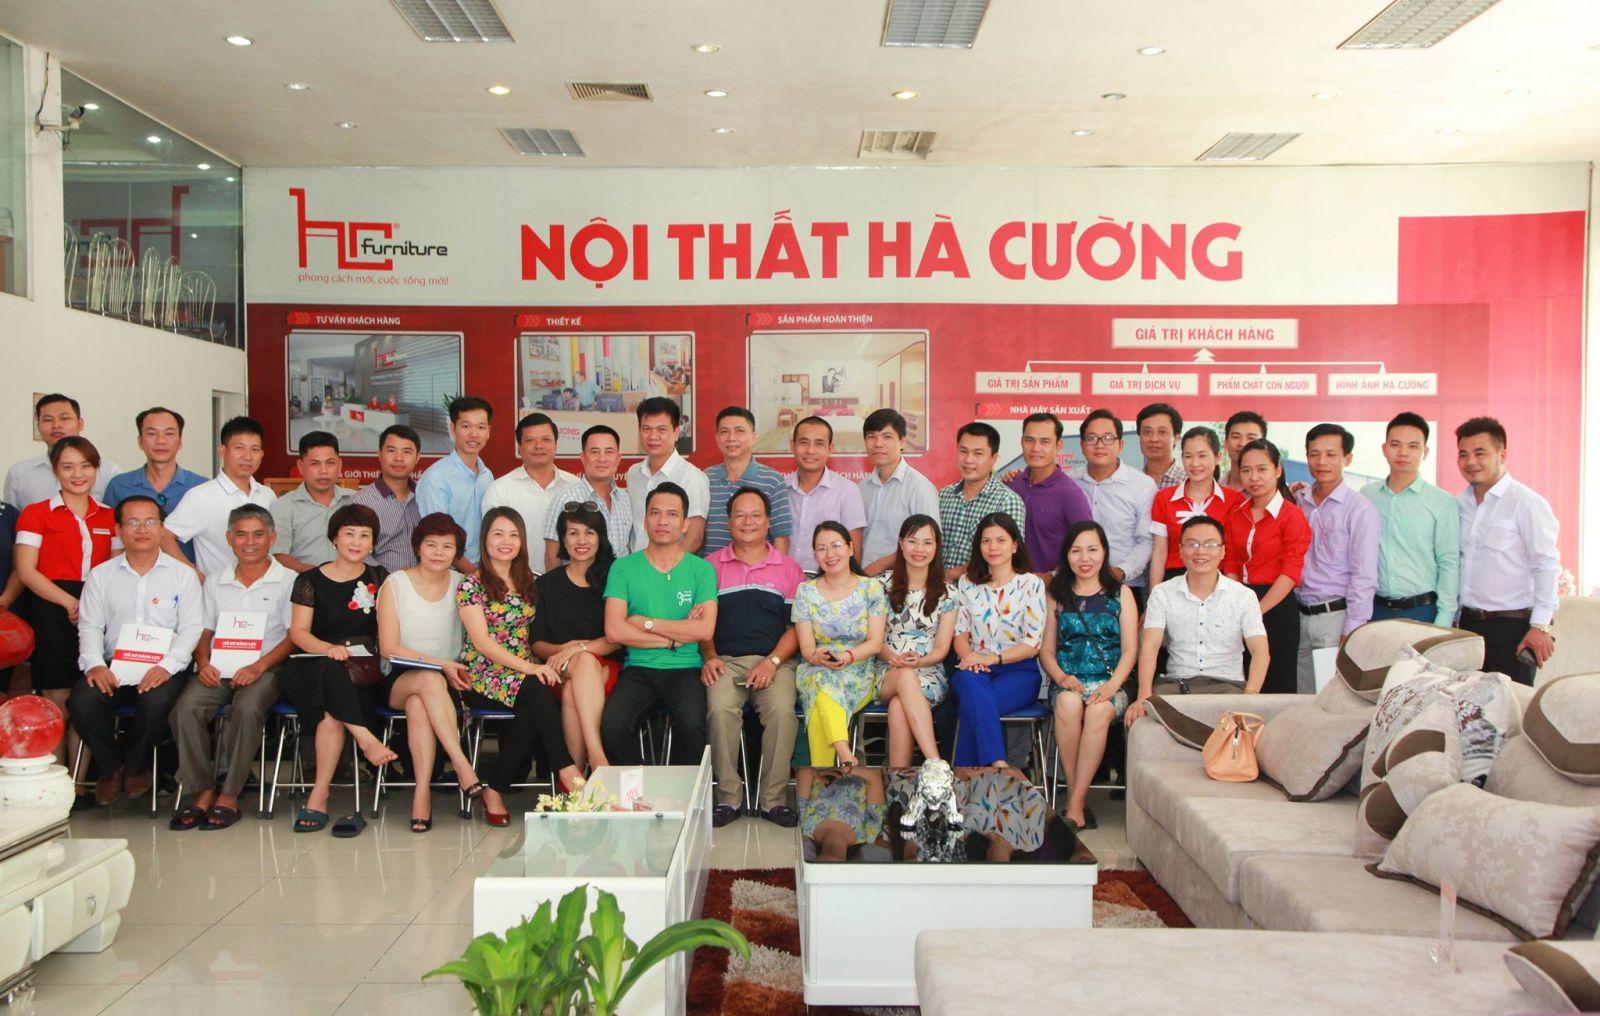 Cong-dong-doanh-nhan-HBC-tham-quan,-hoc-hoi-tai-sieu-thi-noi-that-Ha-Cuong